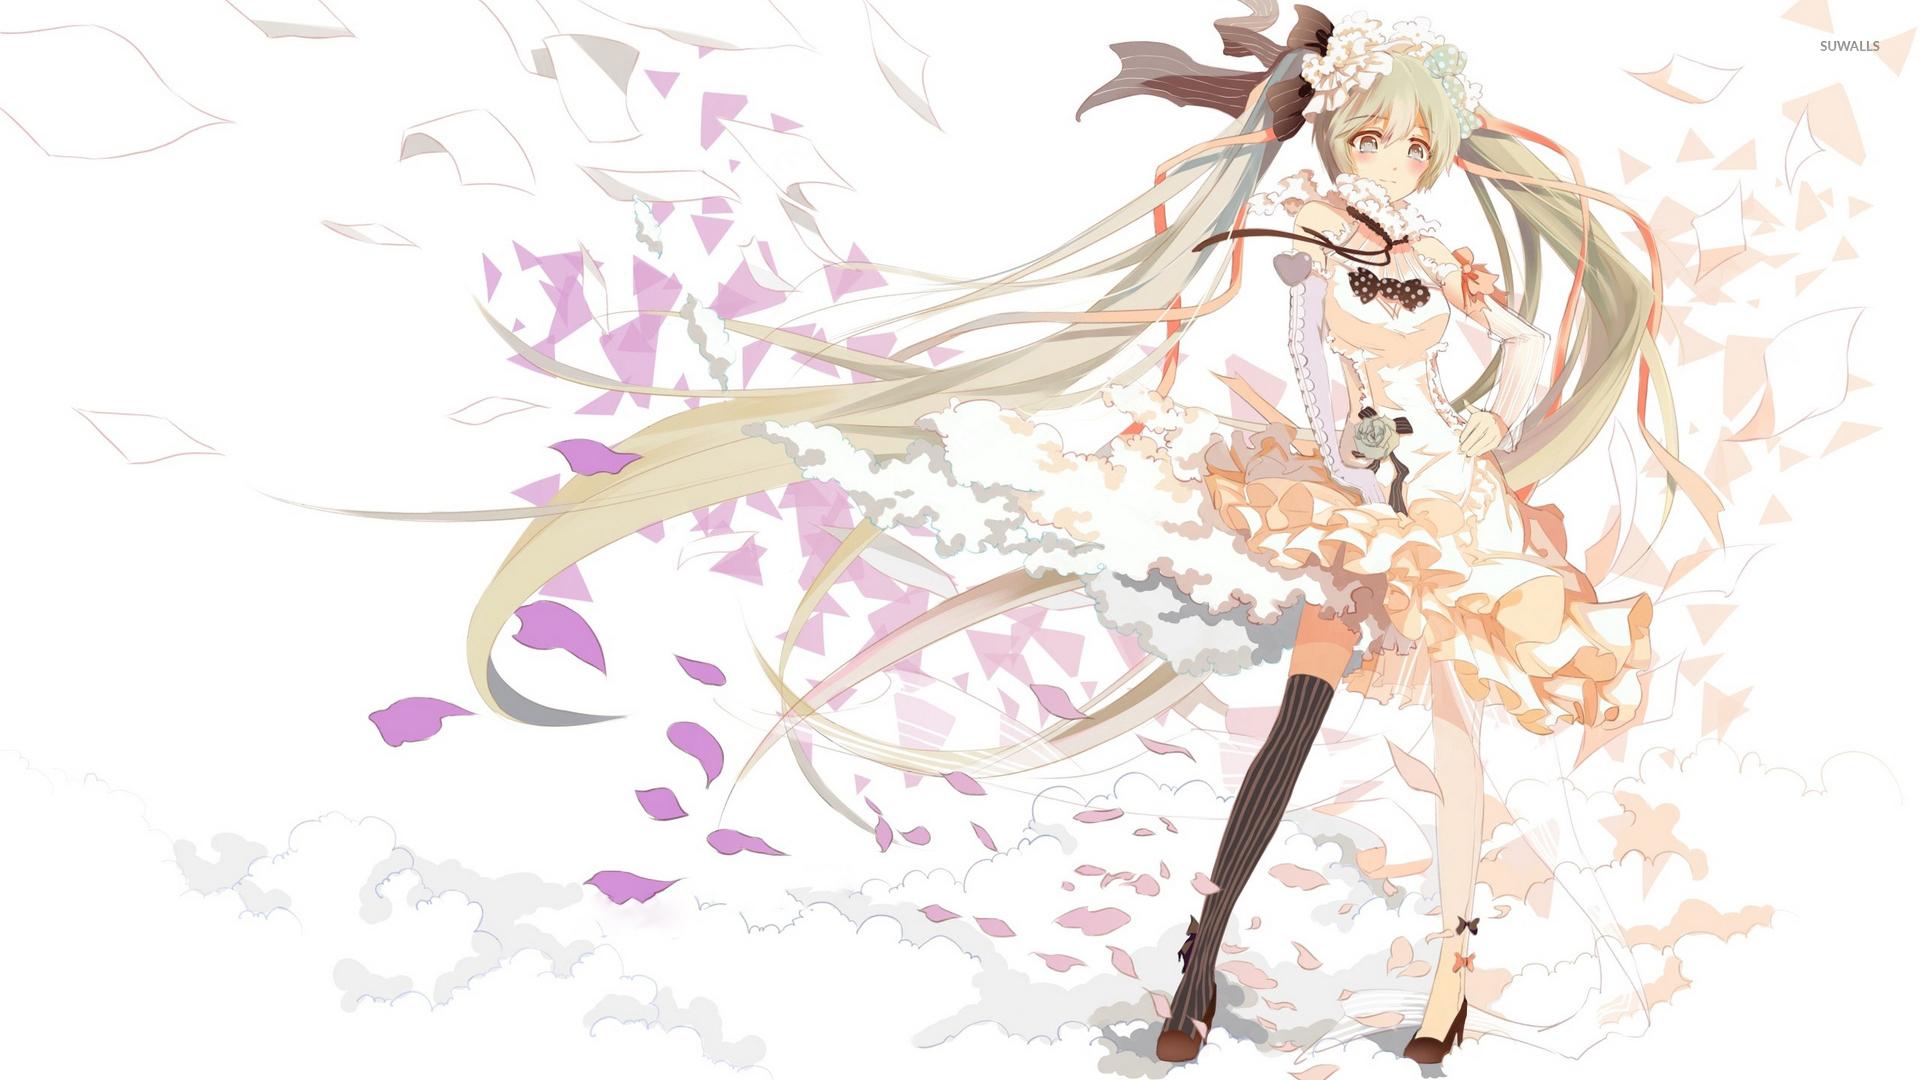 Hatsune Miku In A White Dress Vocaloid Wallpaper Anime